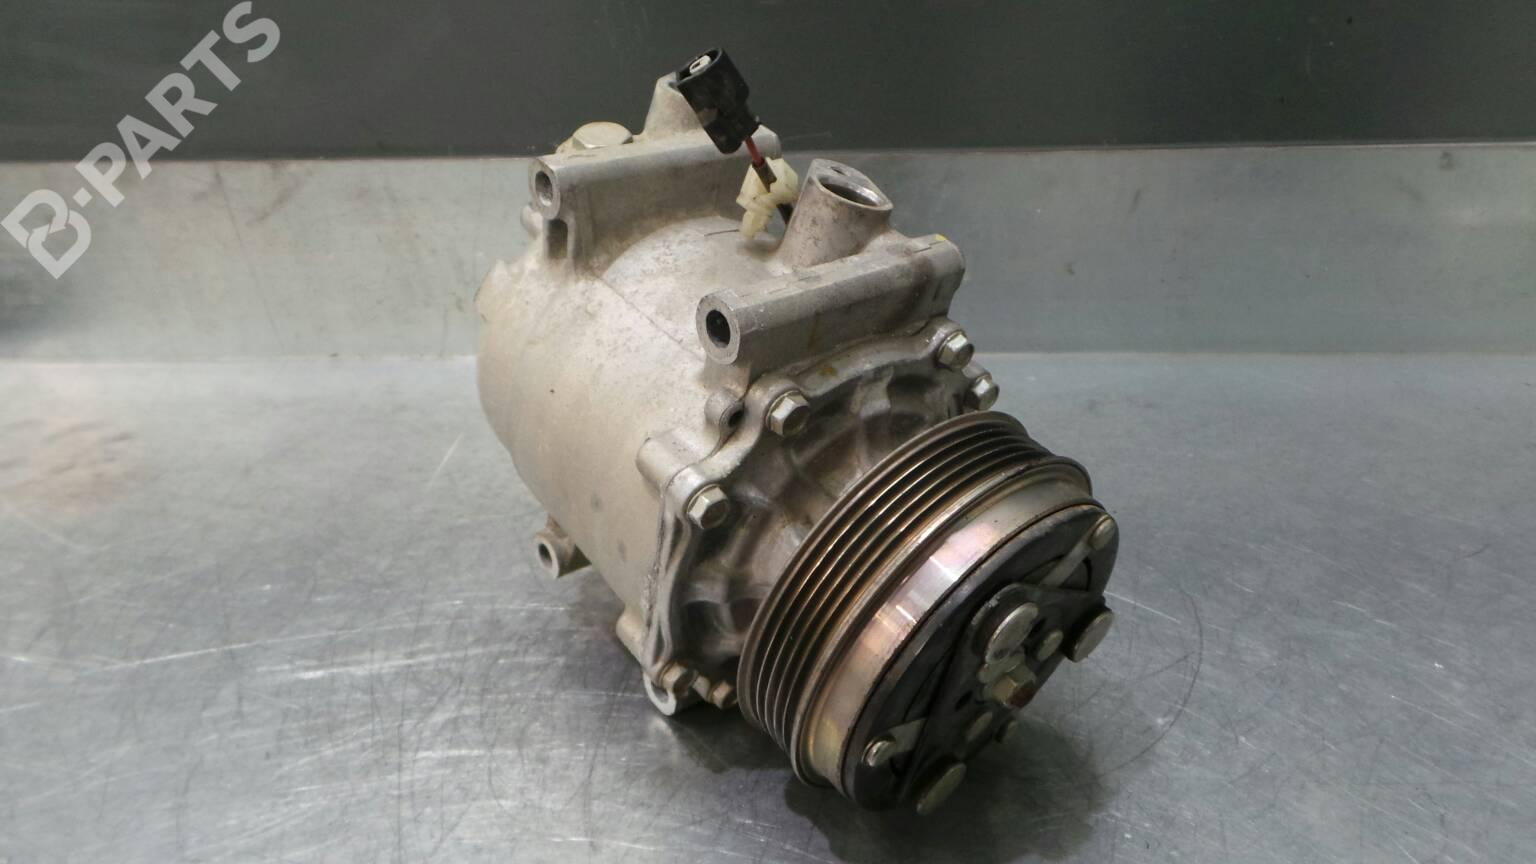 Ac Compressor Honda Jazz Iii Ge Gg Gp 14 201624 Kompresor All New Ori Kb0025568 Hsk 70